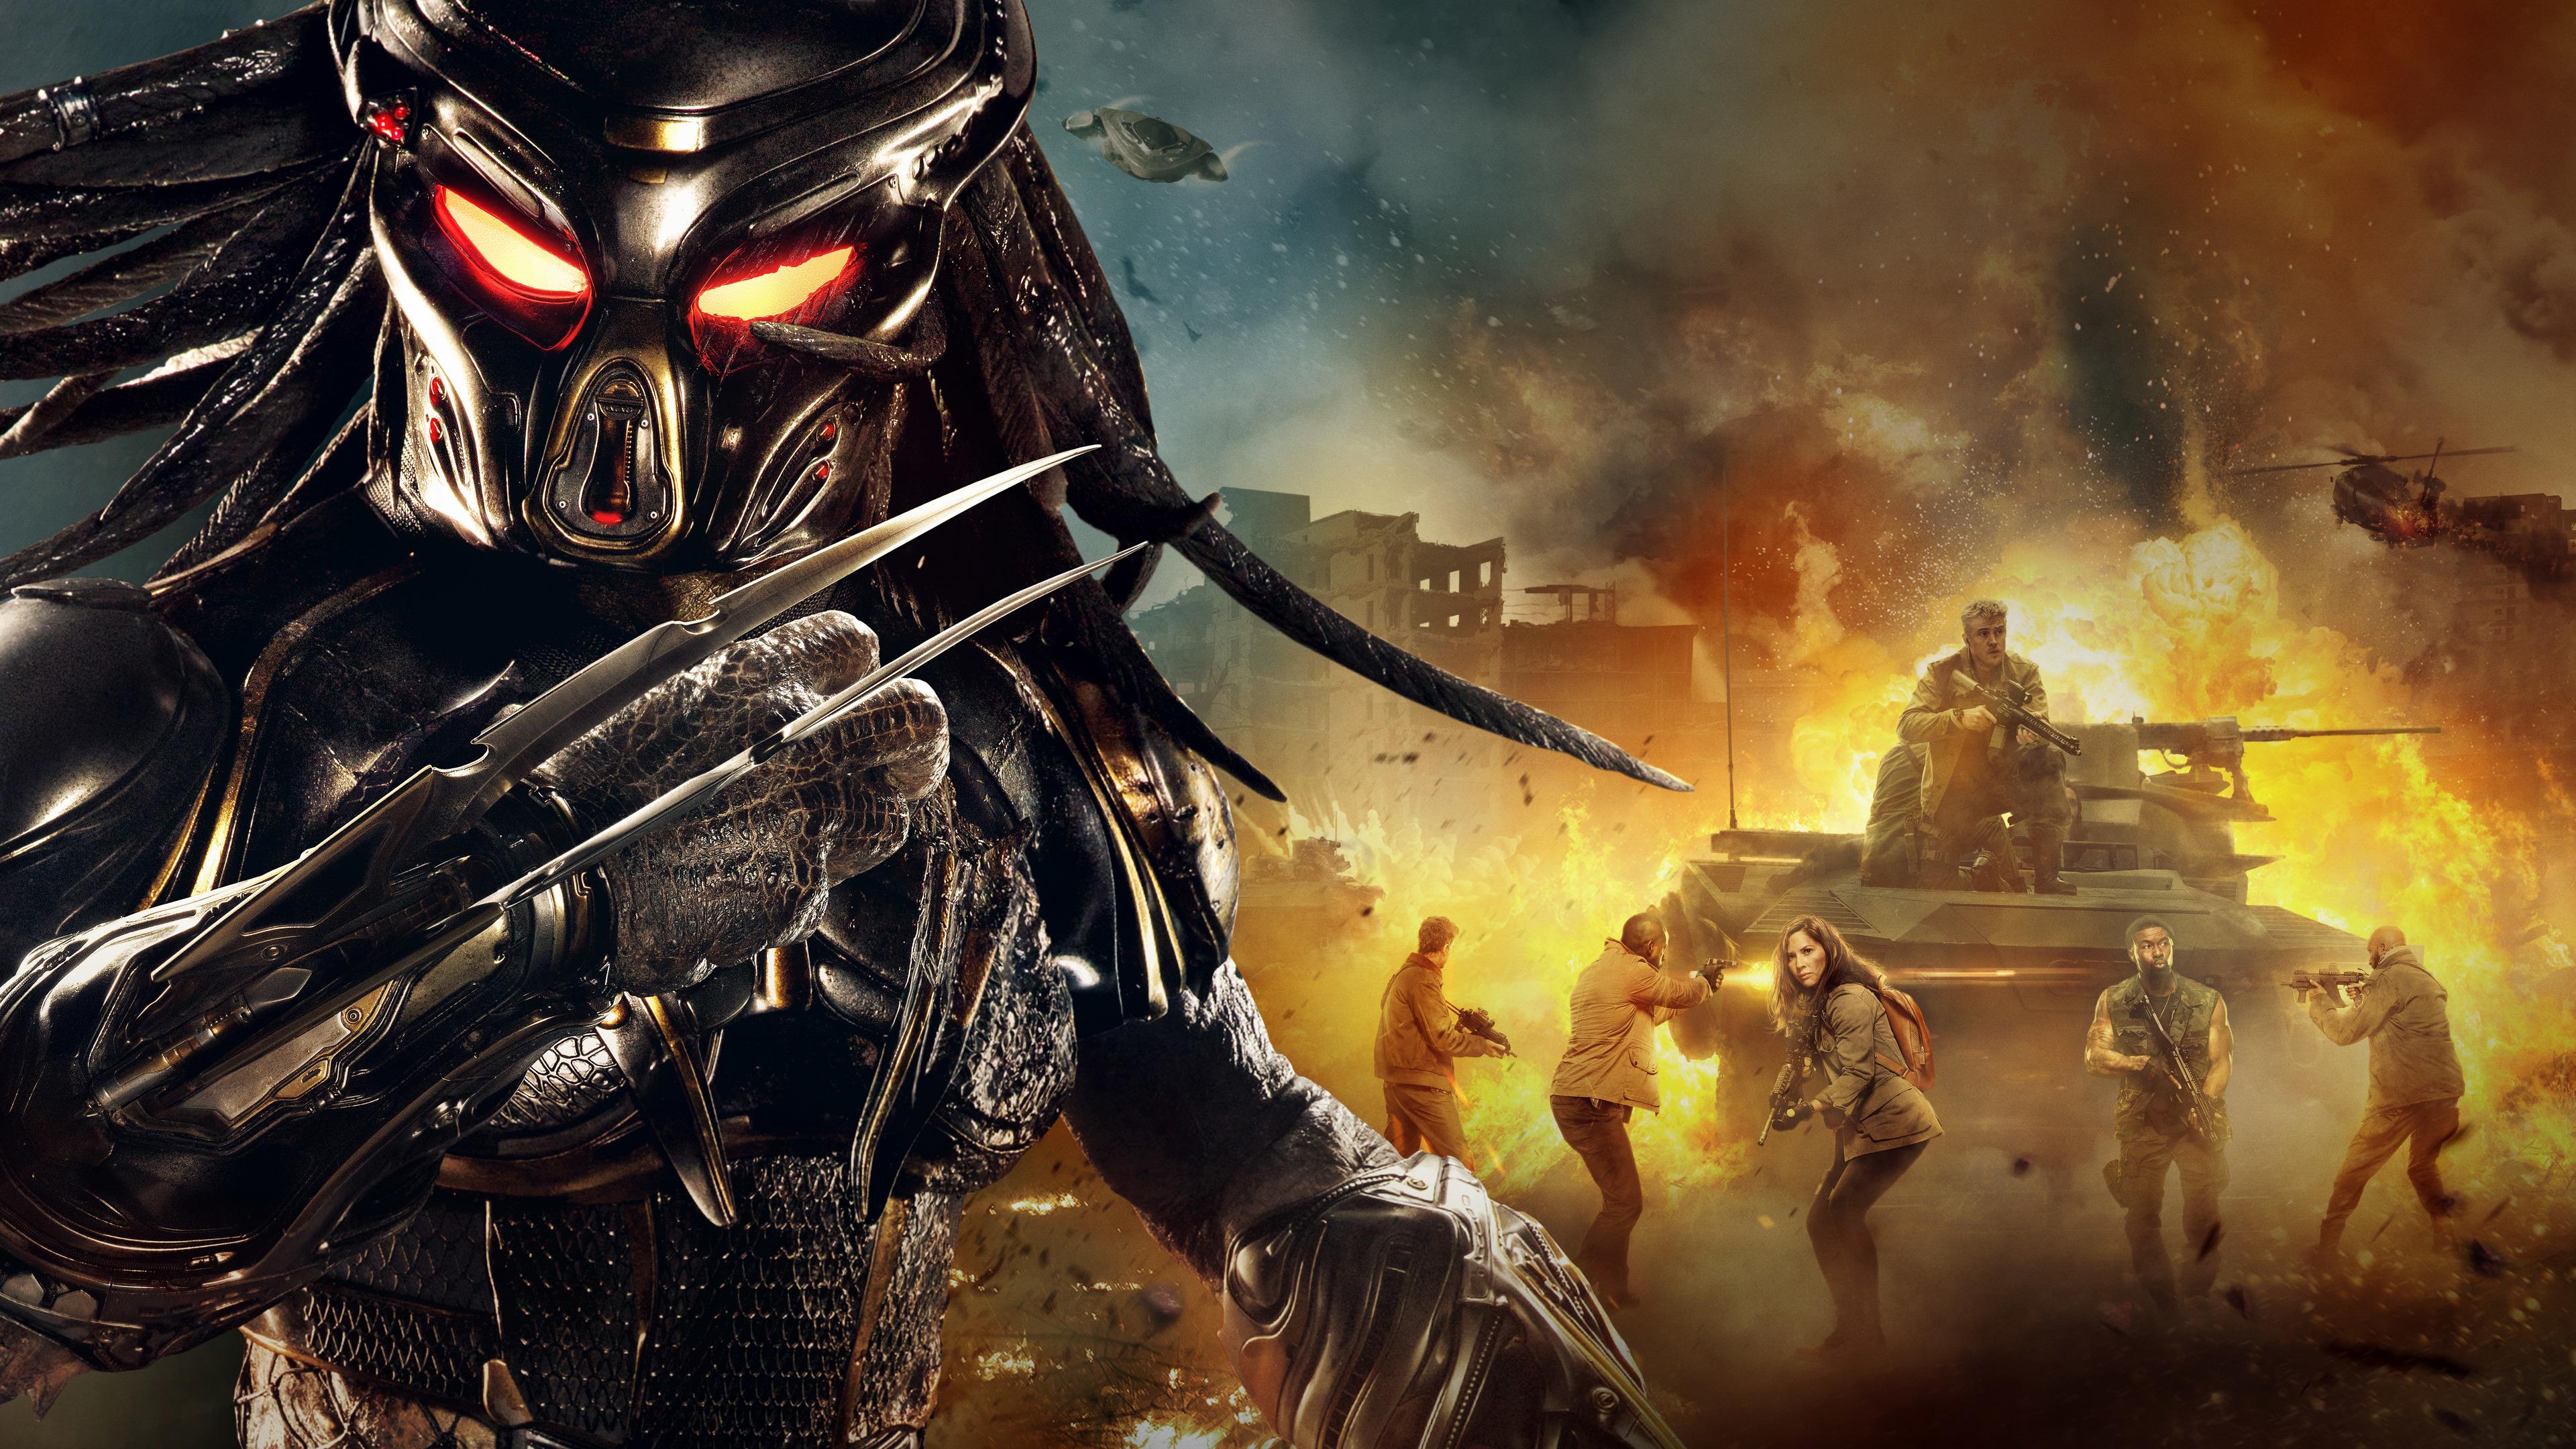 the predator 8k 2018 1540747679 - The Predator 8k 2018 - the predator wallpapers, the predator movie wallpapers, movies wallpapers, hd-wallpapers, 8k wallpapers, 5k wallpapers, 4k-wallpapers, 2018-movies-wallpapers